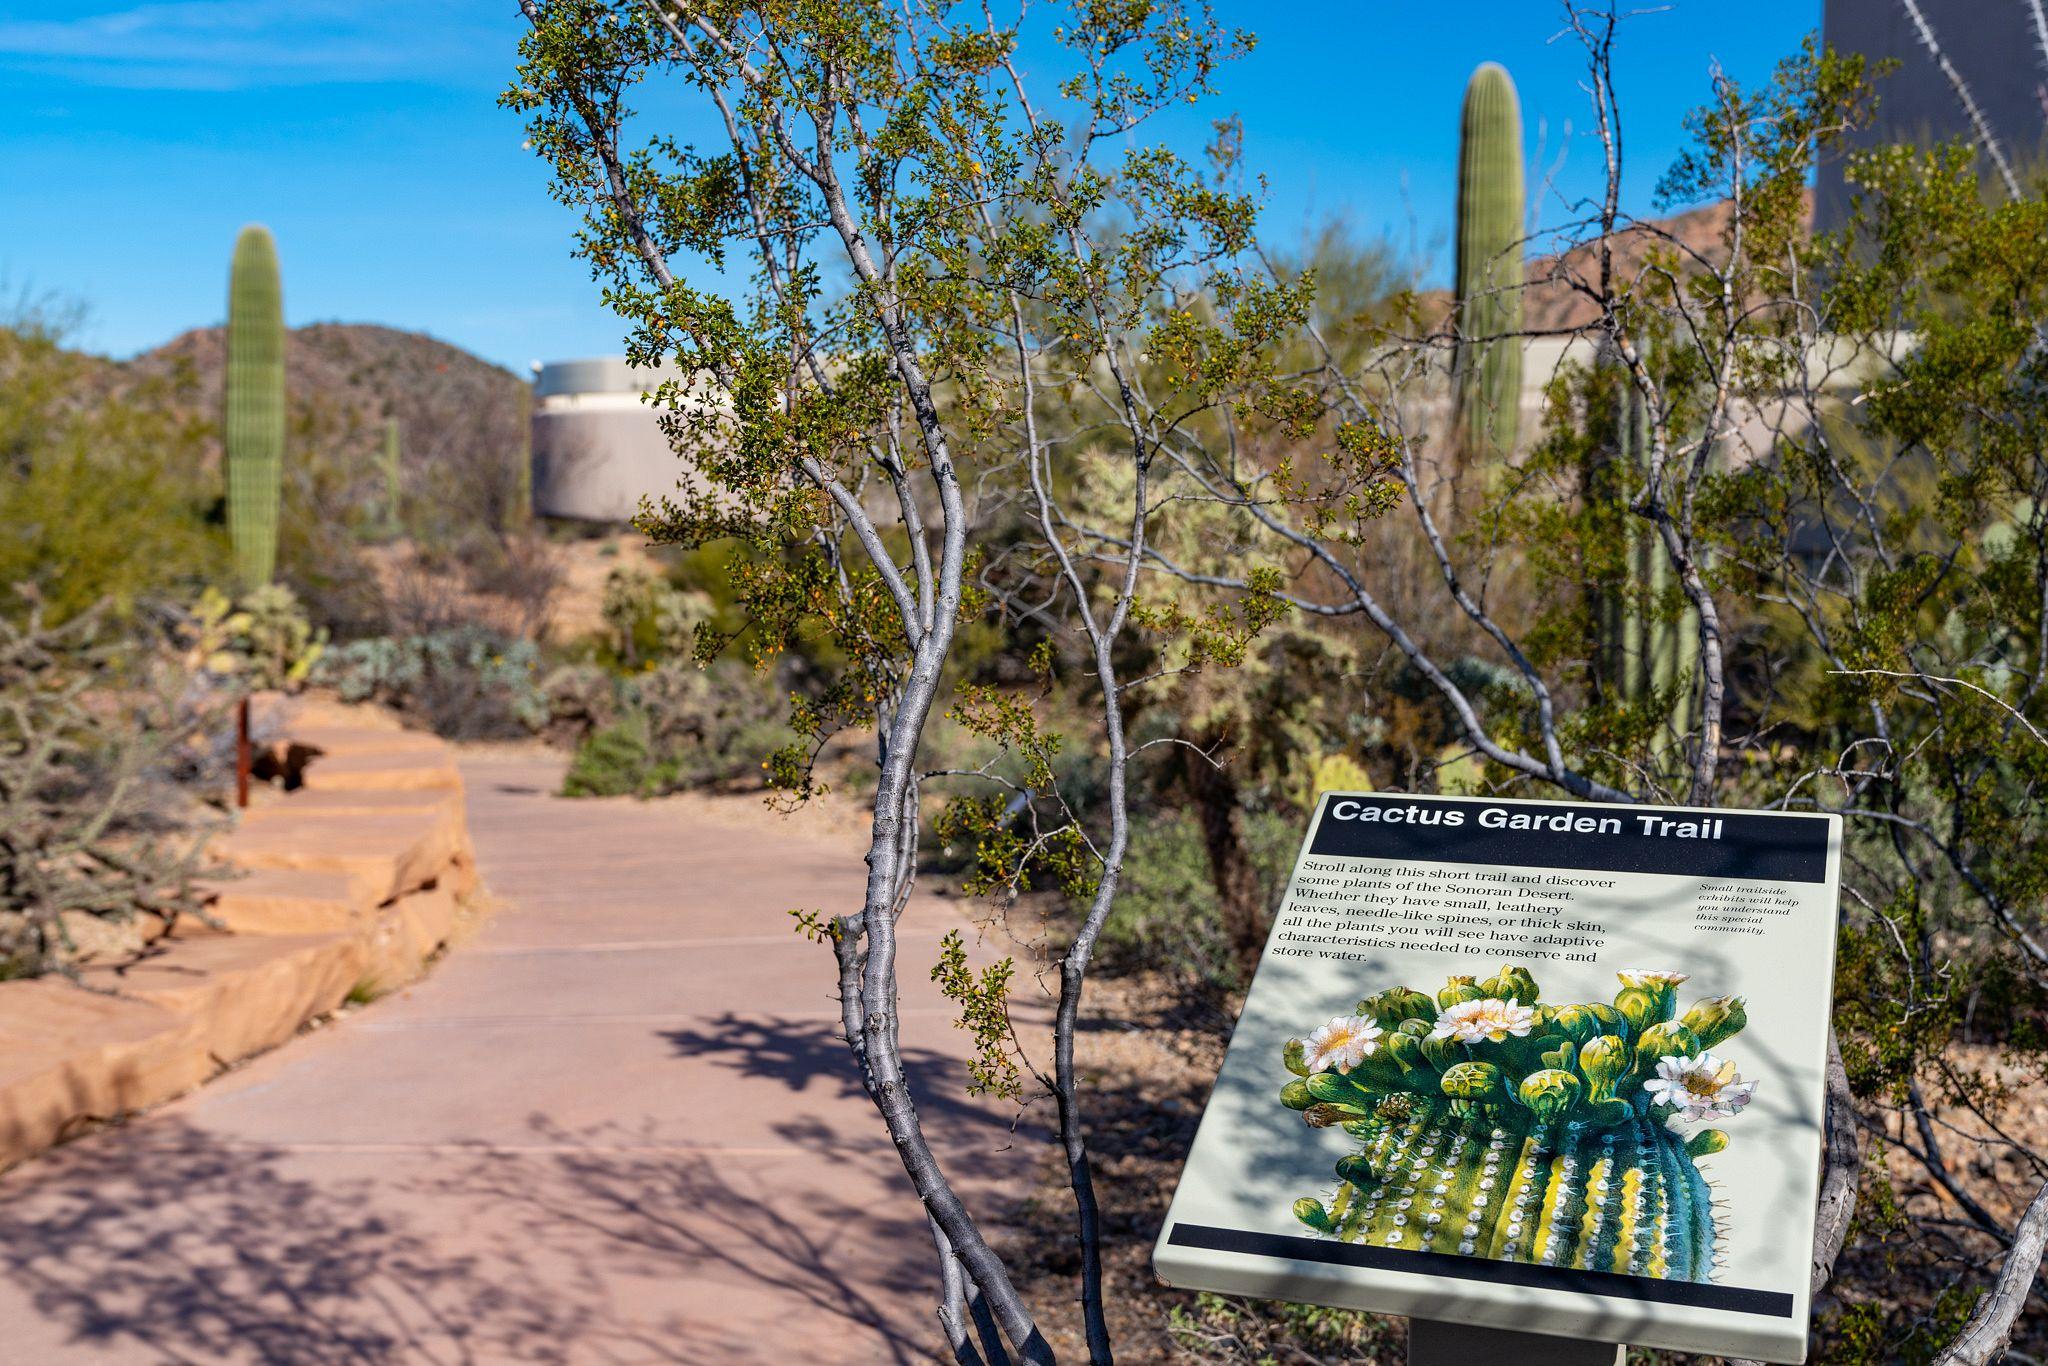 Cactus Garden Trail